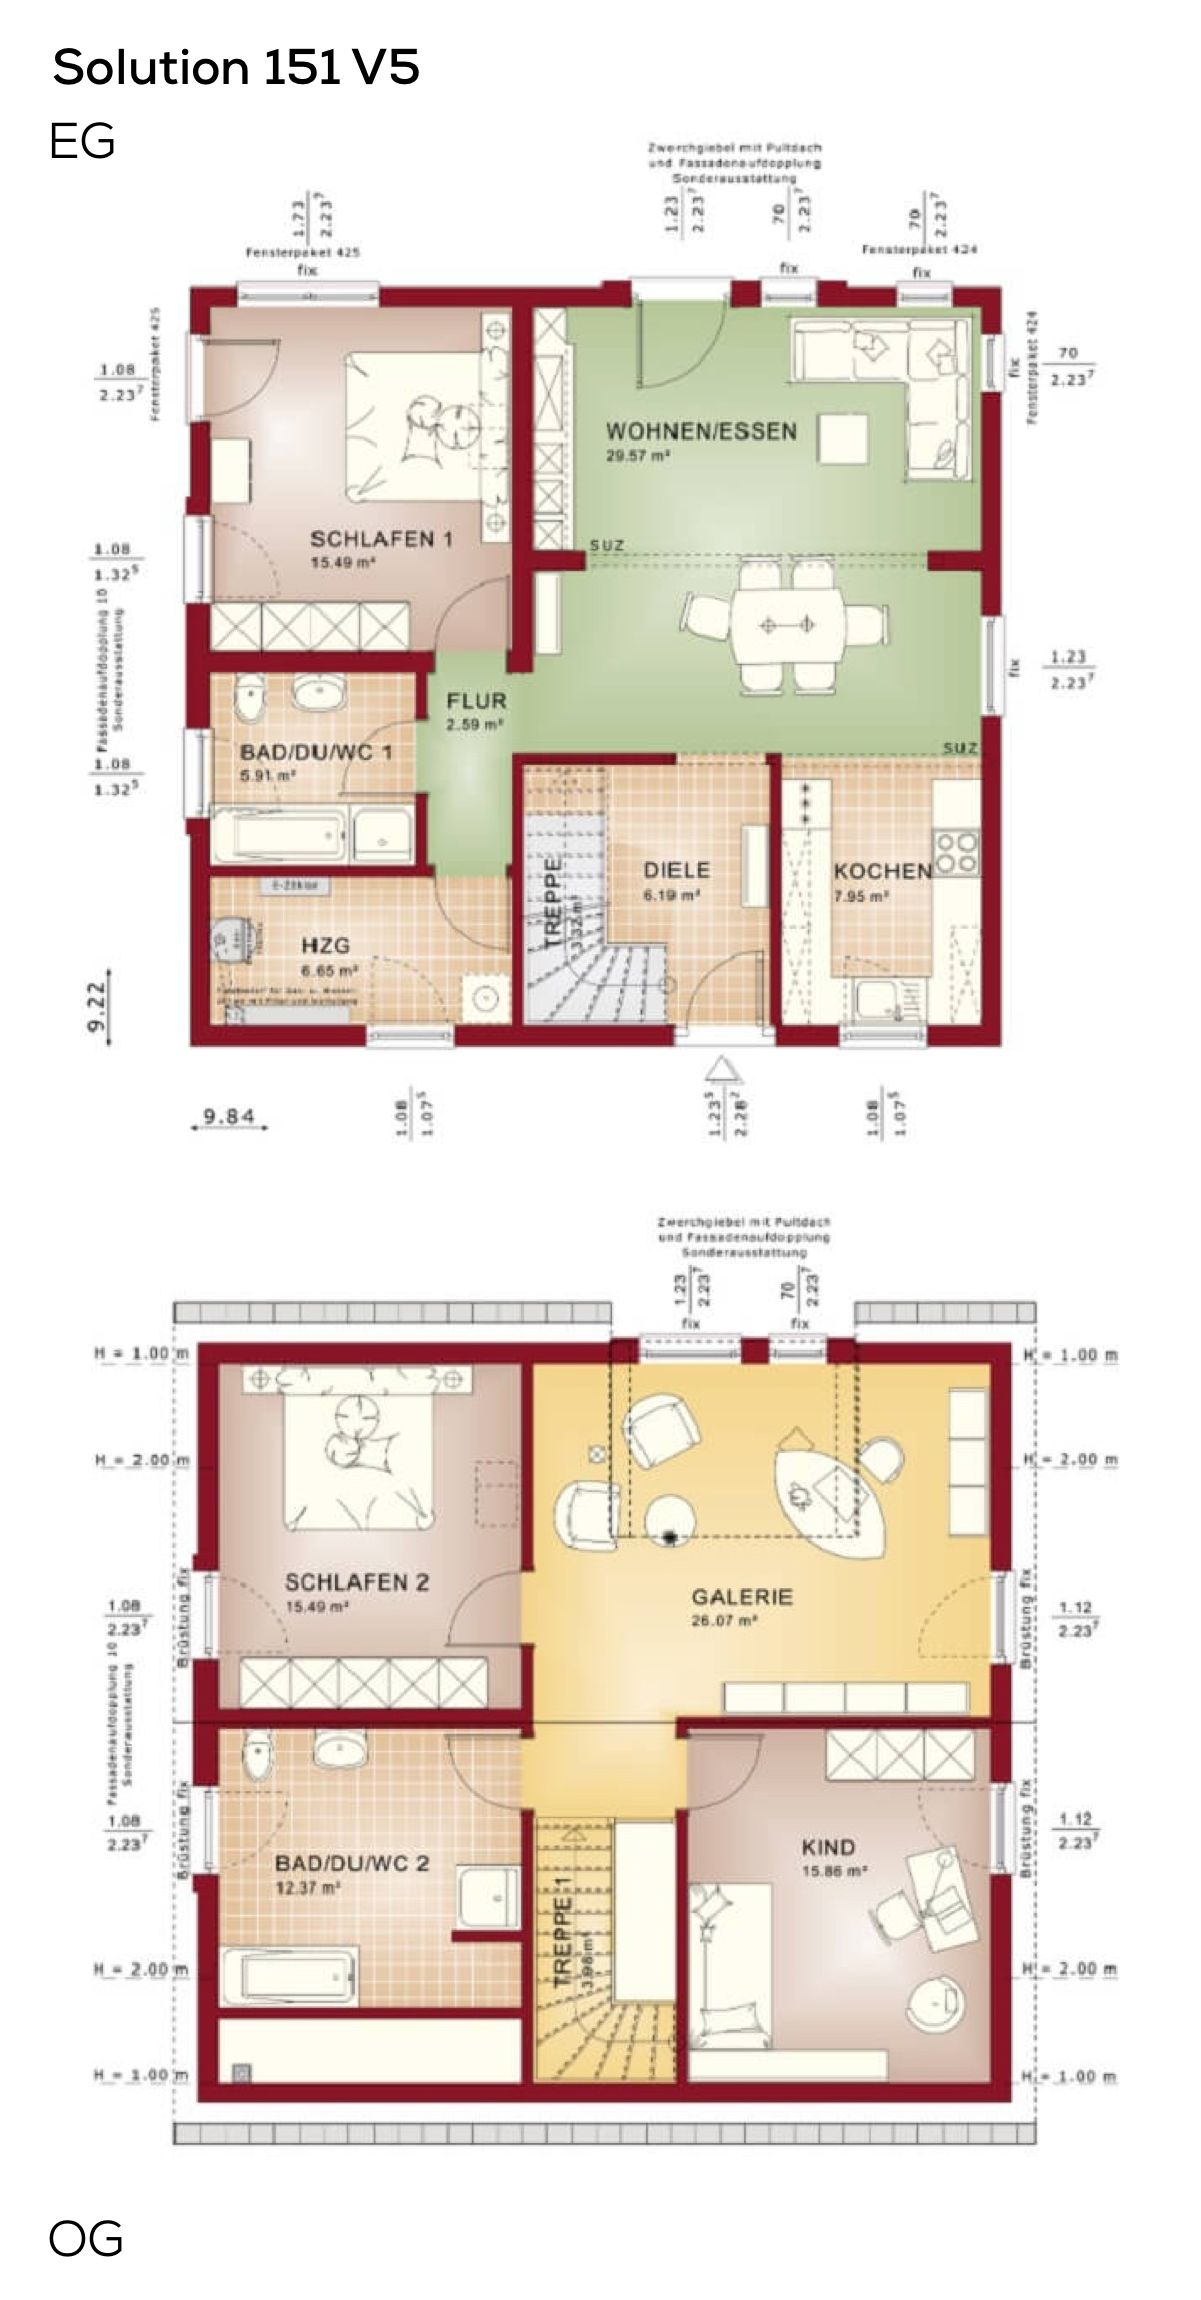 grundrisse einfamlilienhaus mit galerie 5 zimmer satteldach grundriss erdgeschoss offen. Black Bedroom Furniture Sets. Home Design Ideas